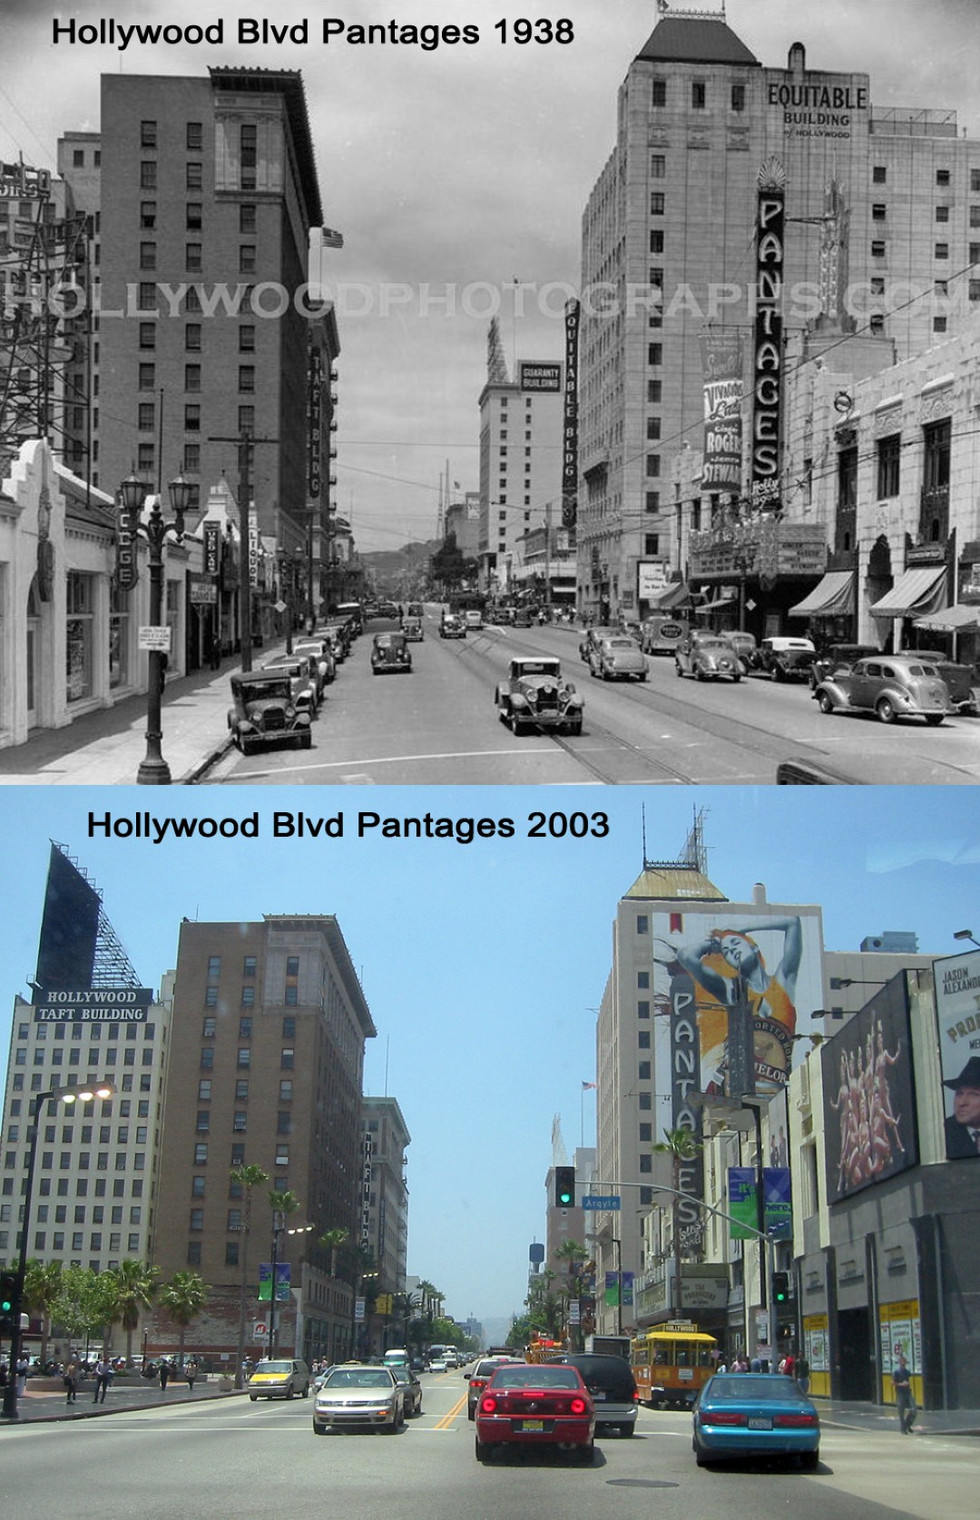 Hollywood blvd Pantages 1938 & 2003